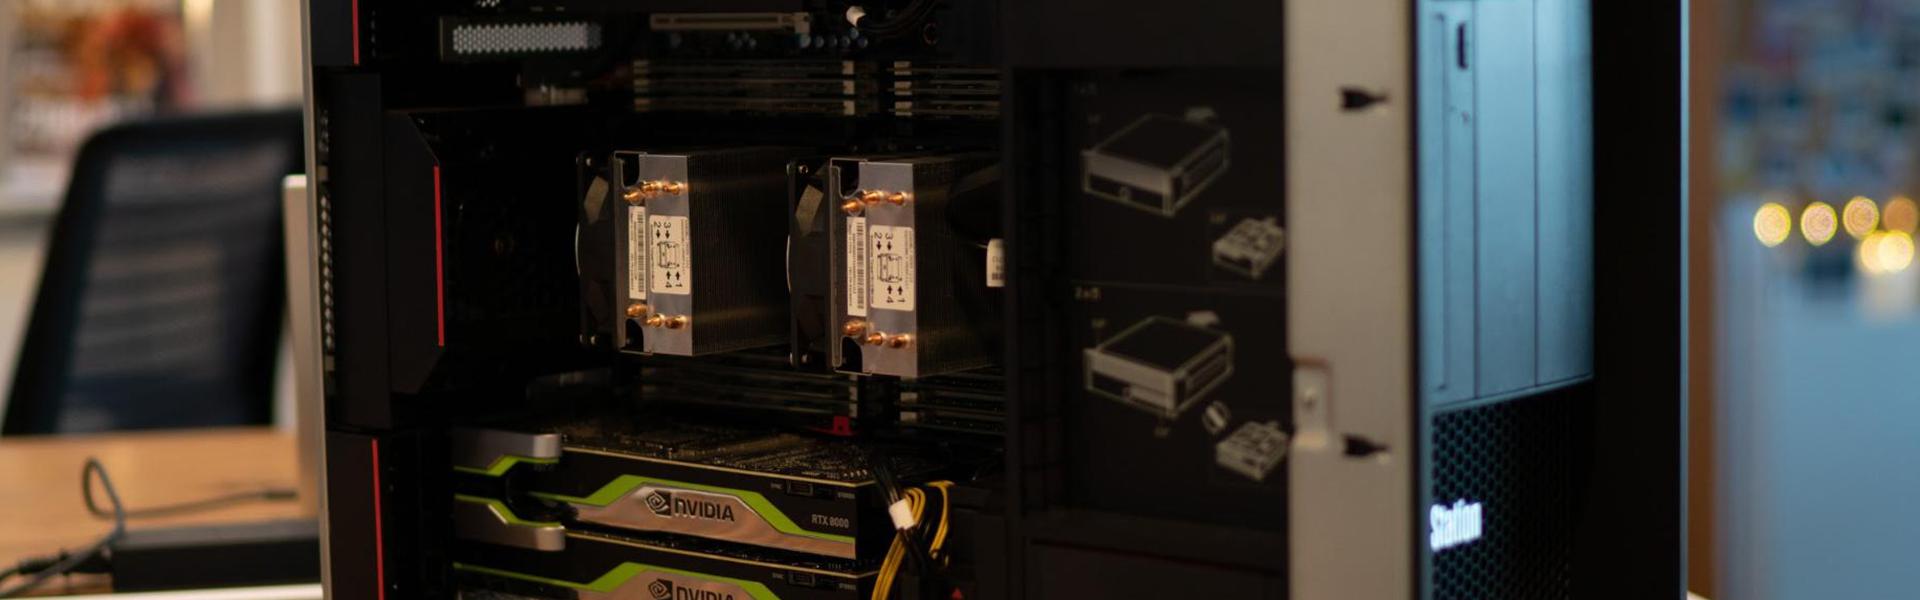 NVIDIA graphics cards inside a Lenovo Thinkstation computer